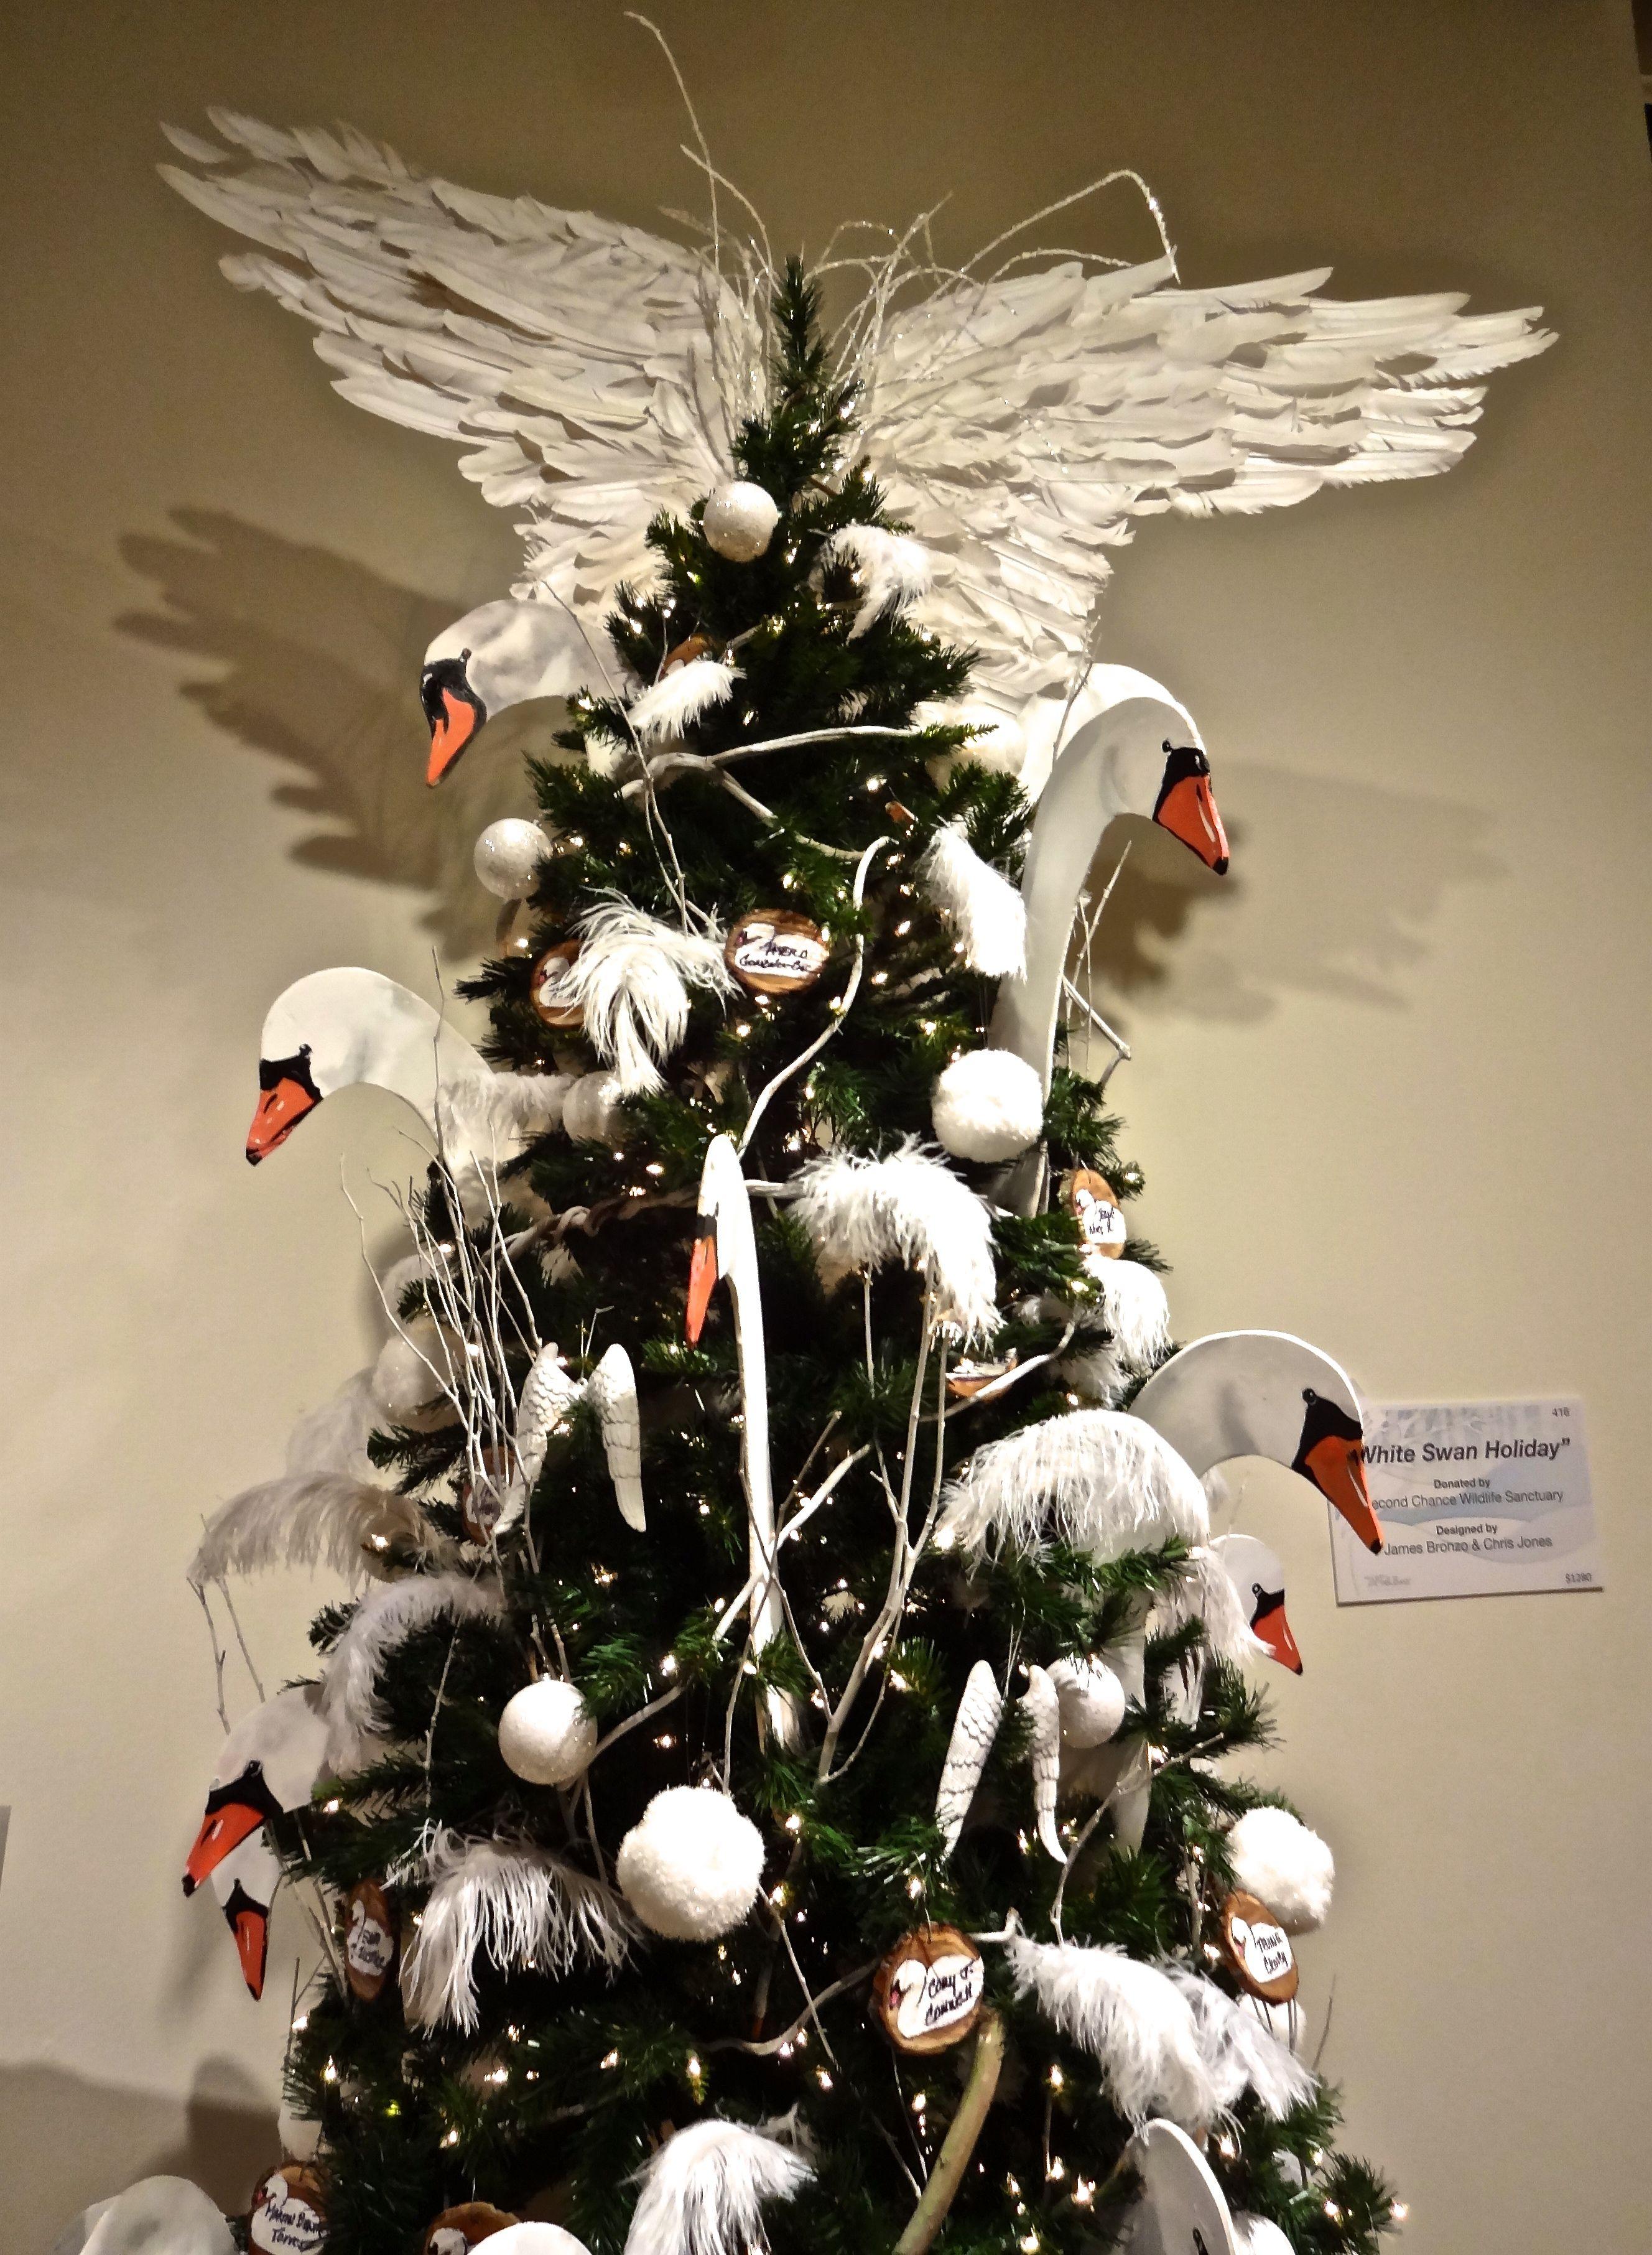 White Swan Christmas Tree At Oma Festival Of Trees In 2020 Orlando Museum Of Art Florida Christmas Christmas Tree